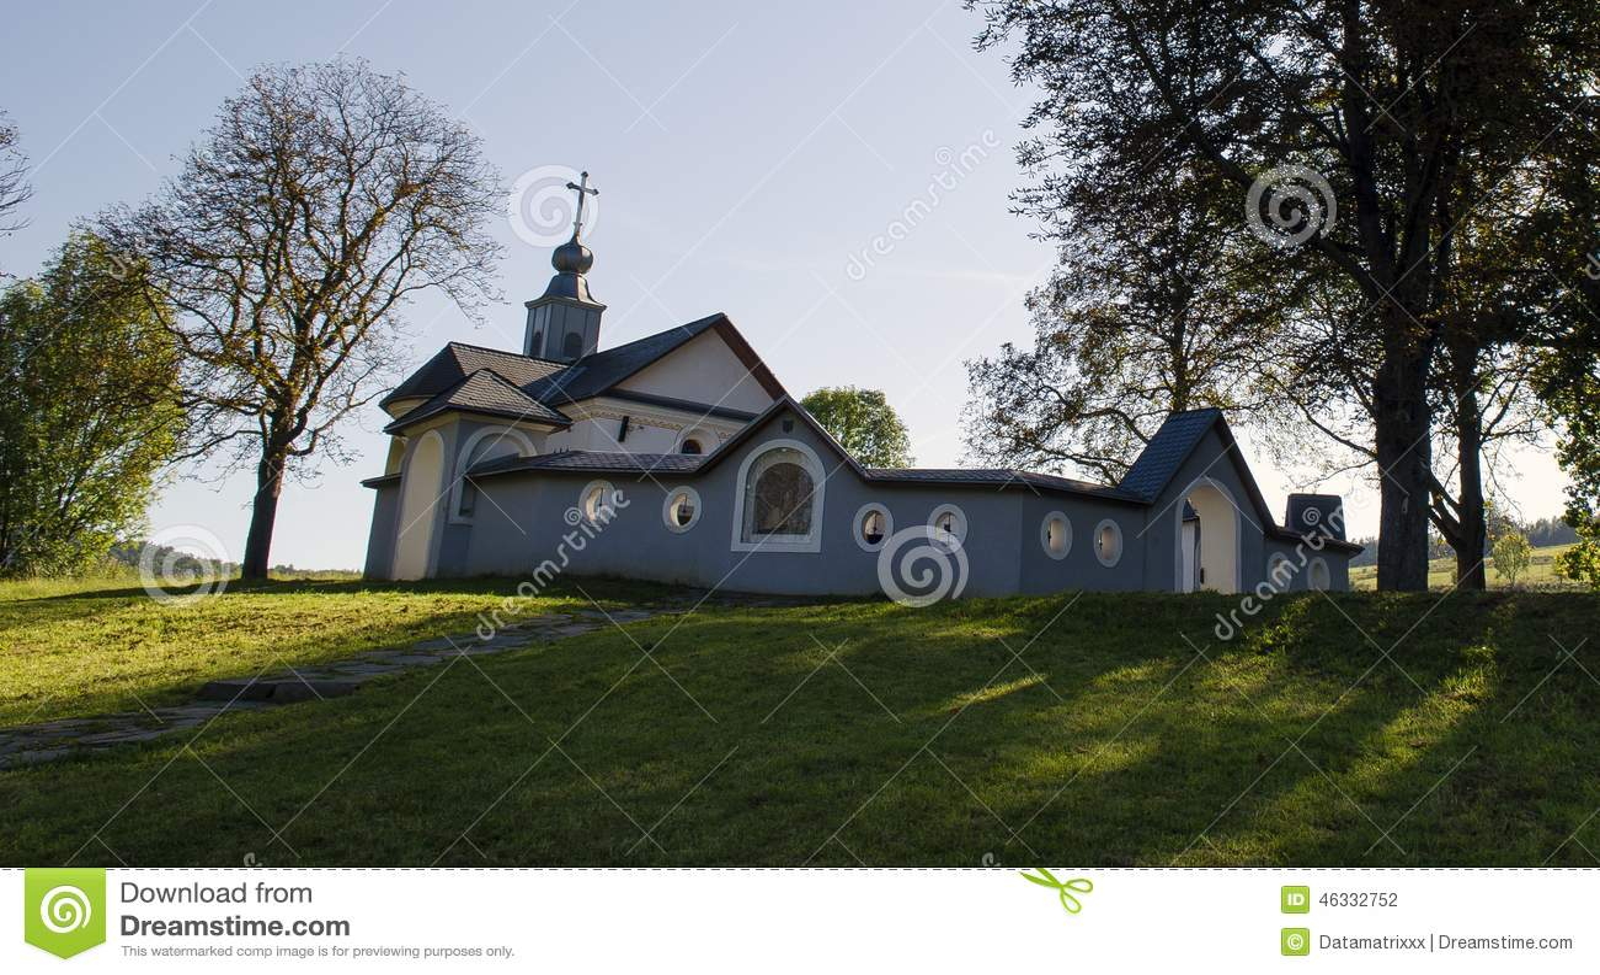 Banska Bystrica - Urpin